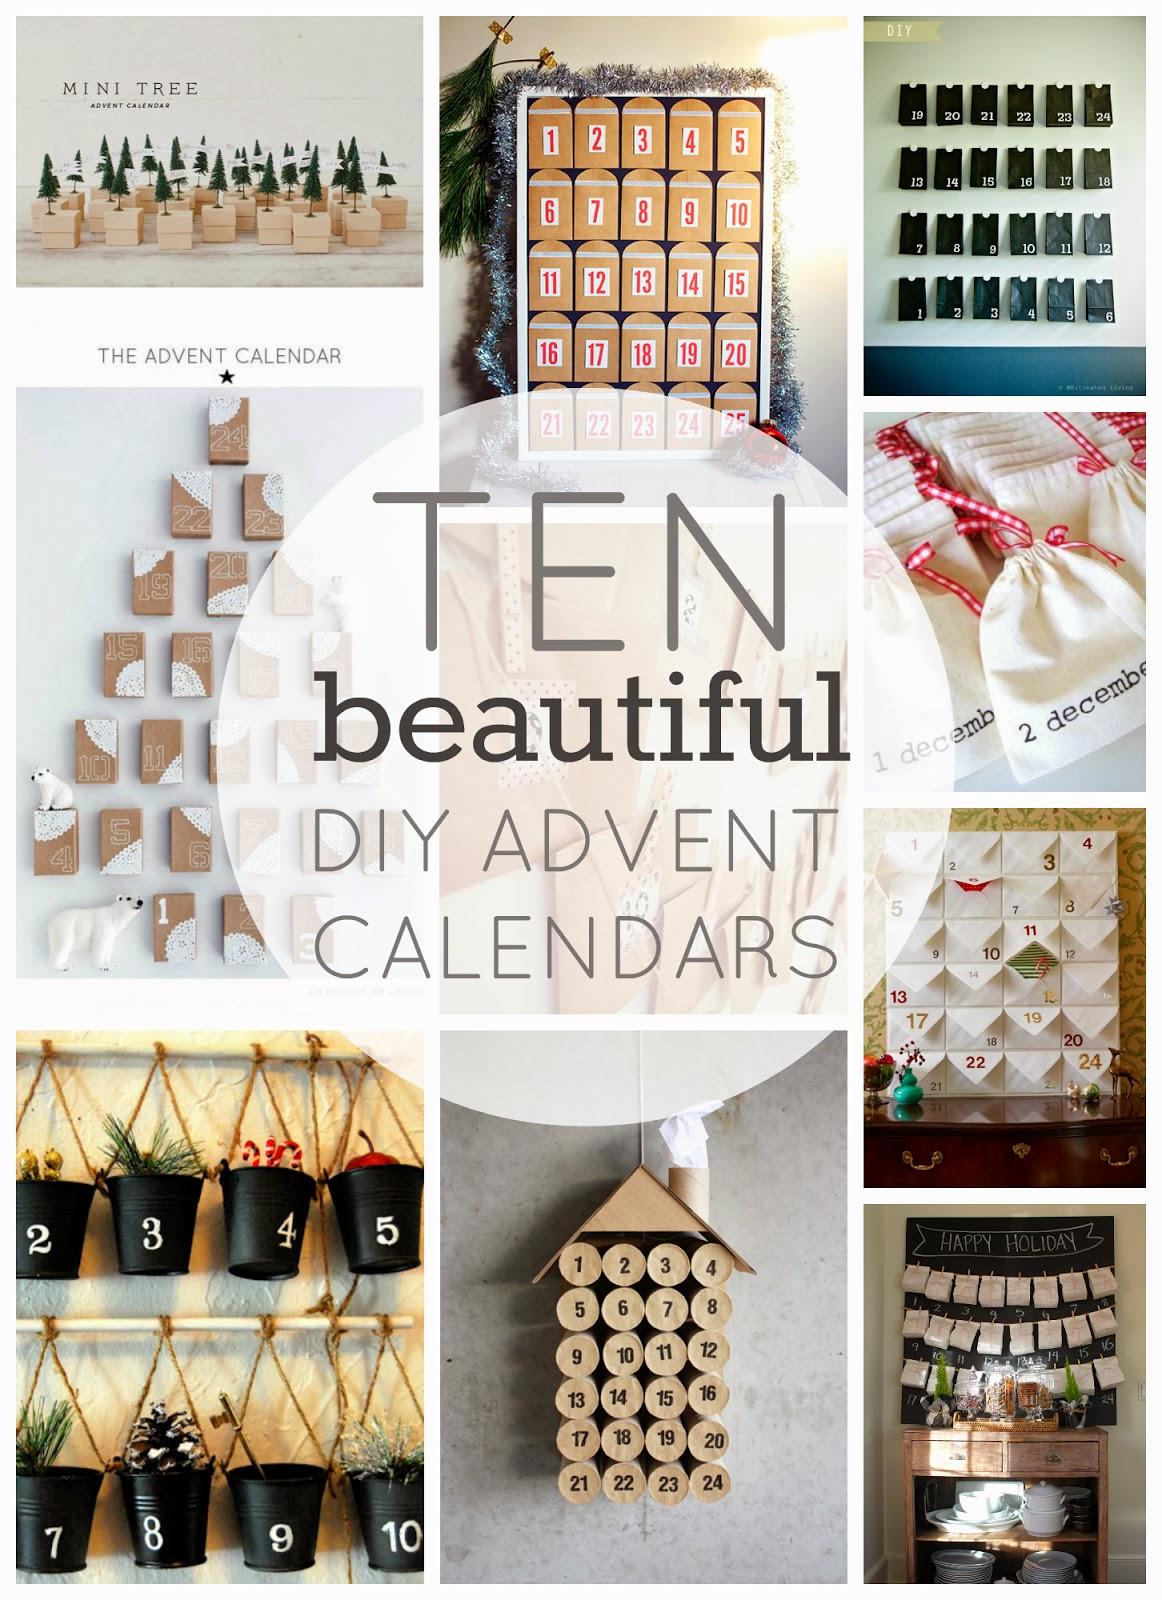 Advent Calendar Ideas Diy : Clever and adorable diy advent calendars library